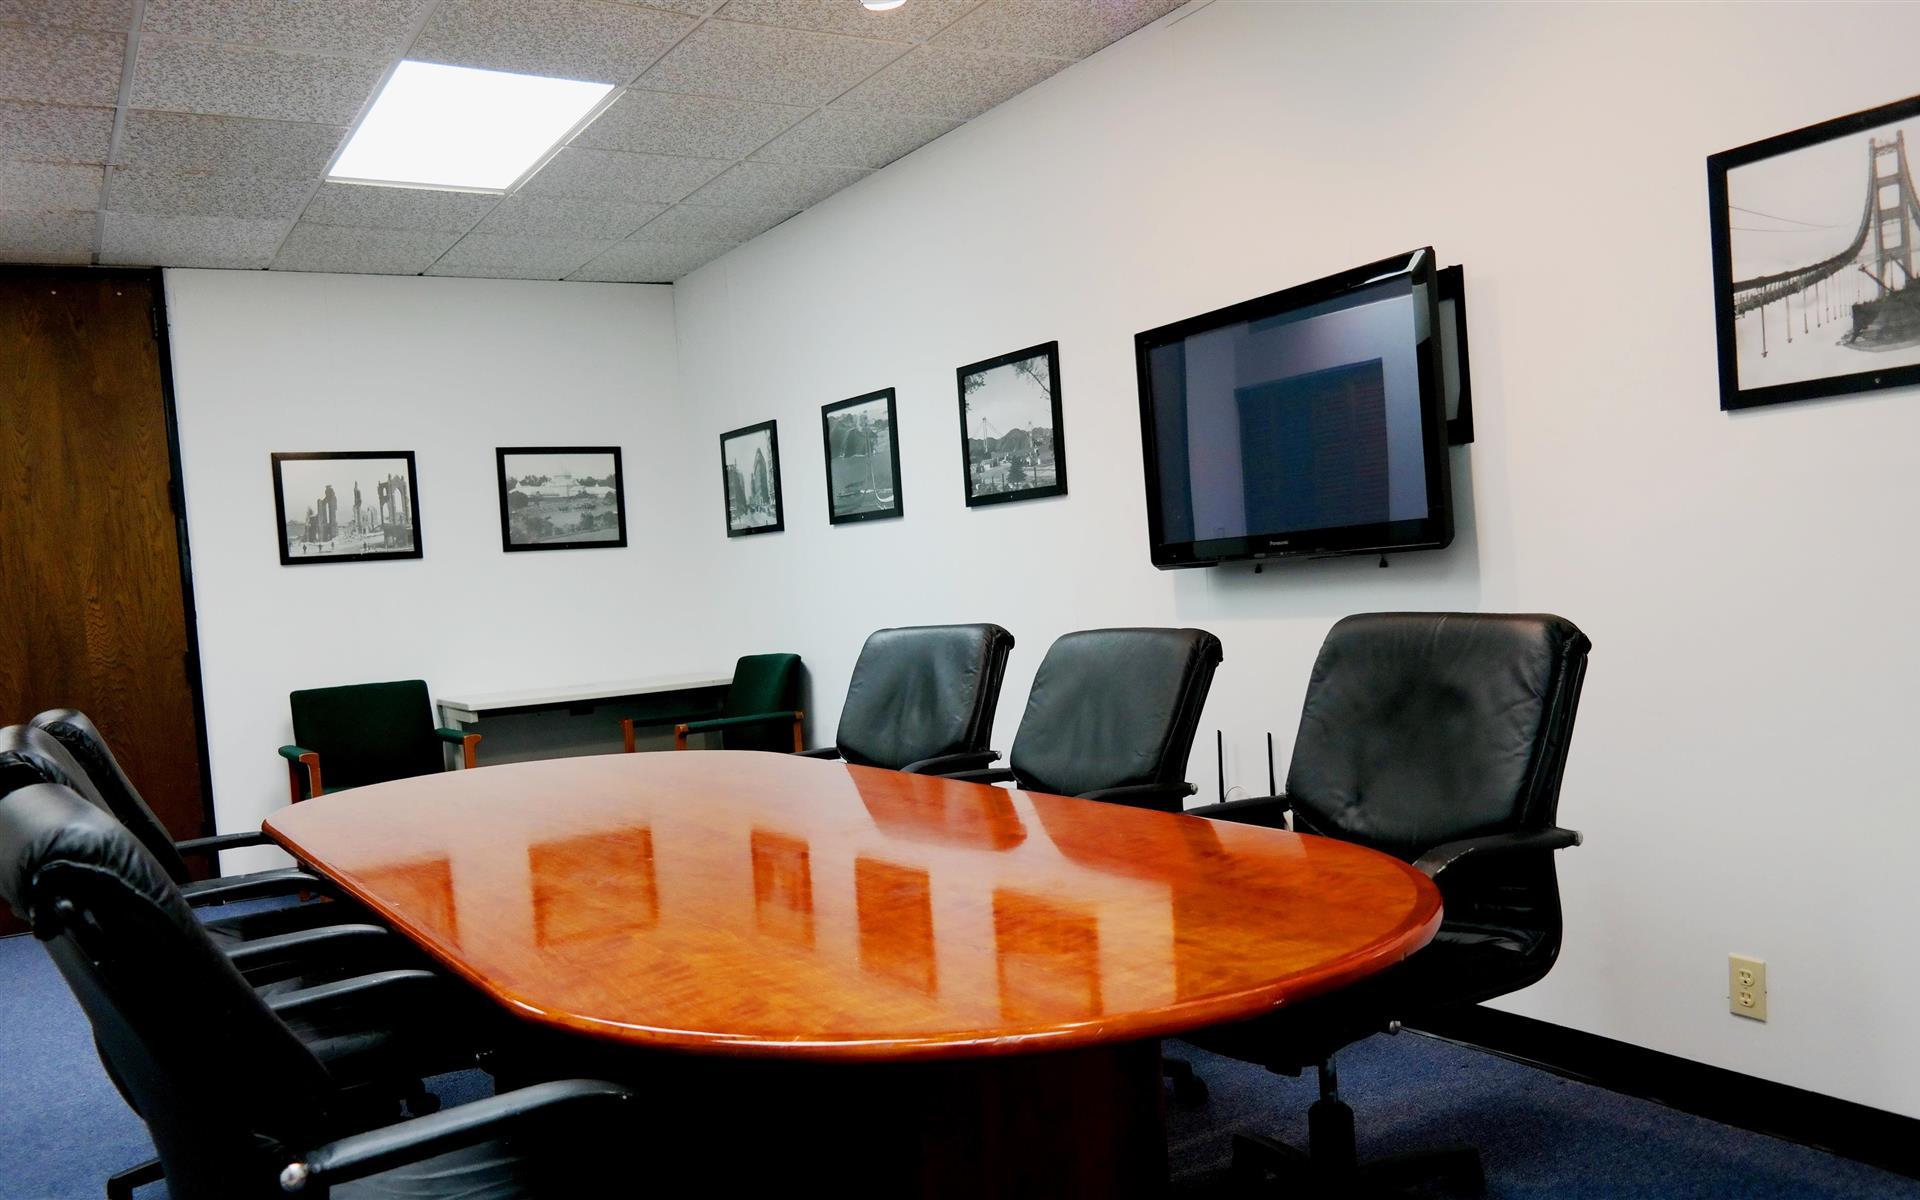 1 Hallidie Plaza - Office + Conference Room + kitchen